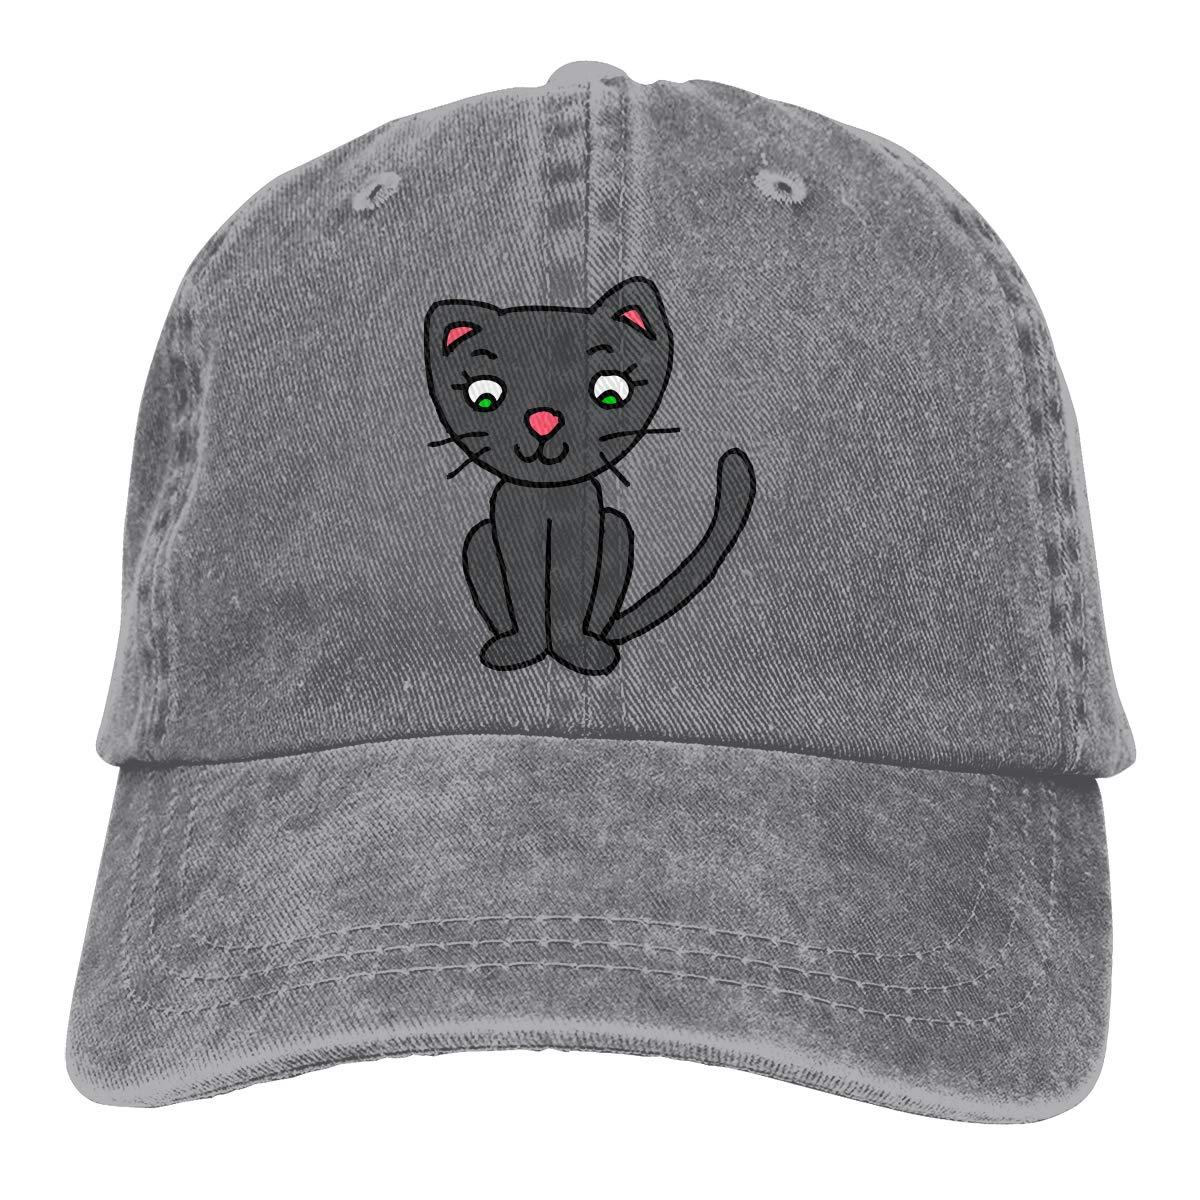 Adult Unisex Jeans Cap Adjustable Hat Cute Naughty Kitty Cat Cotton Denim